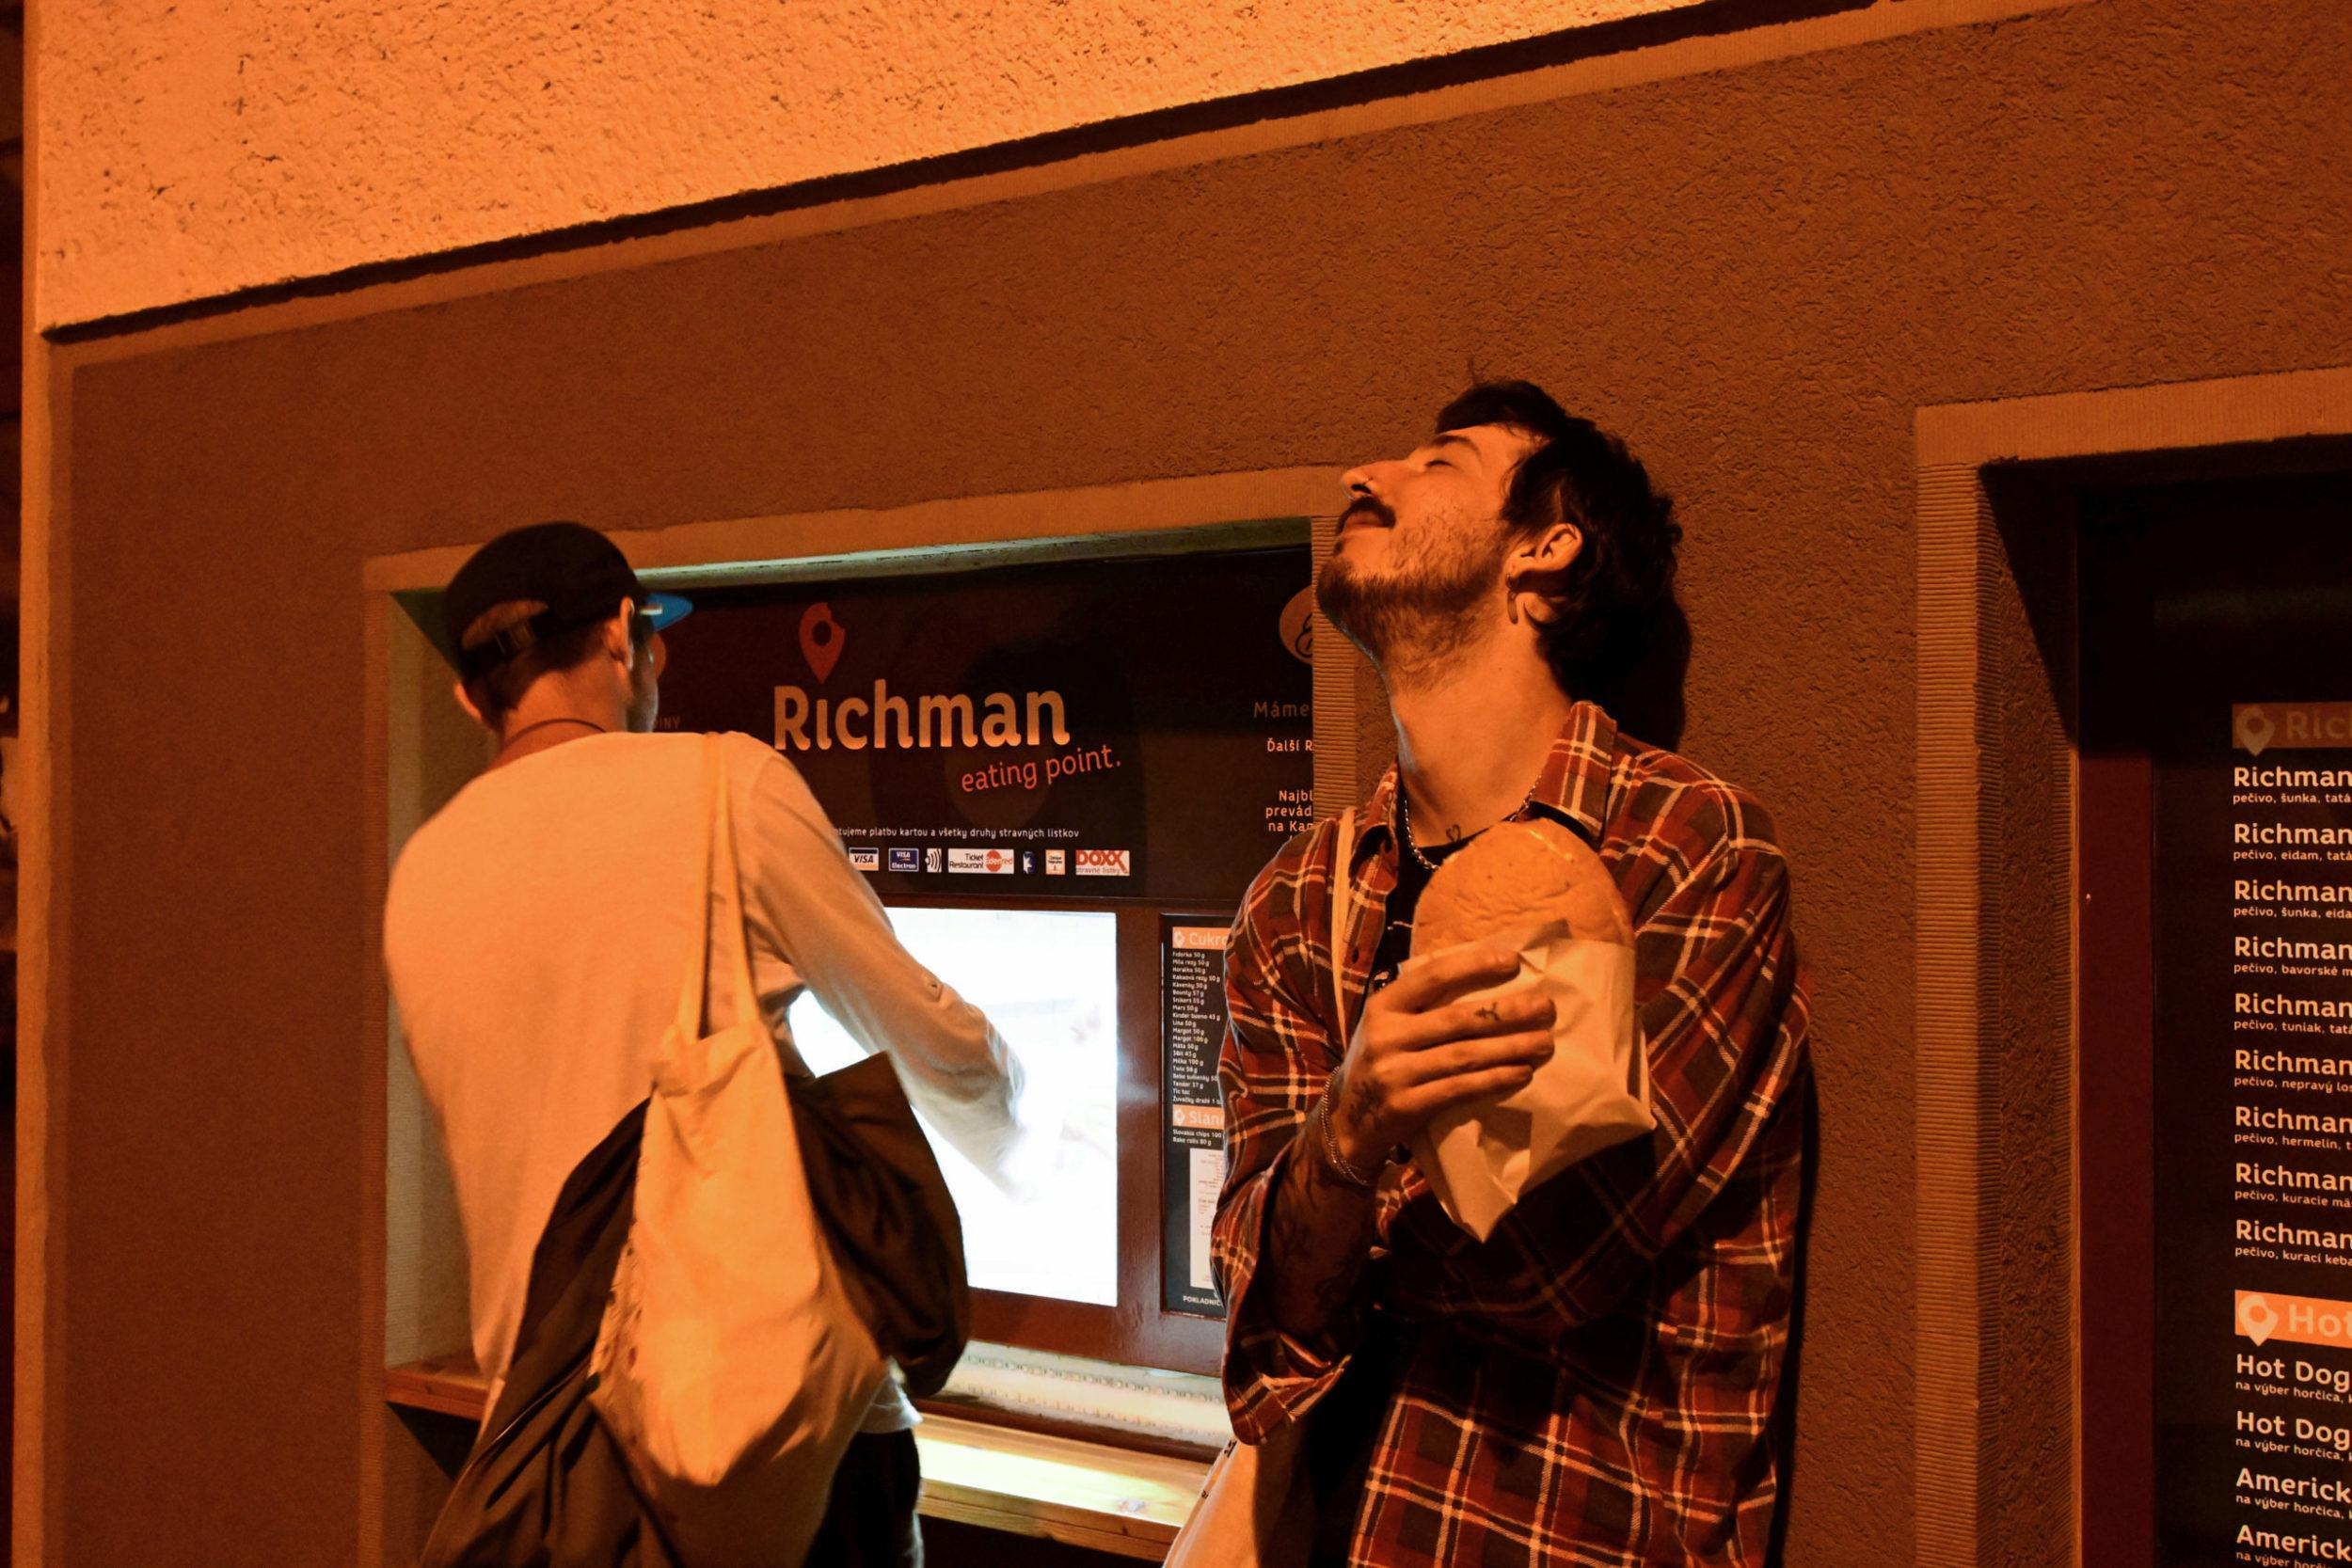 Richman fast food